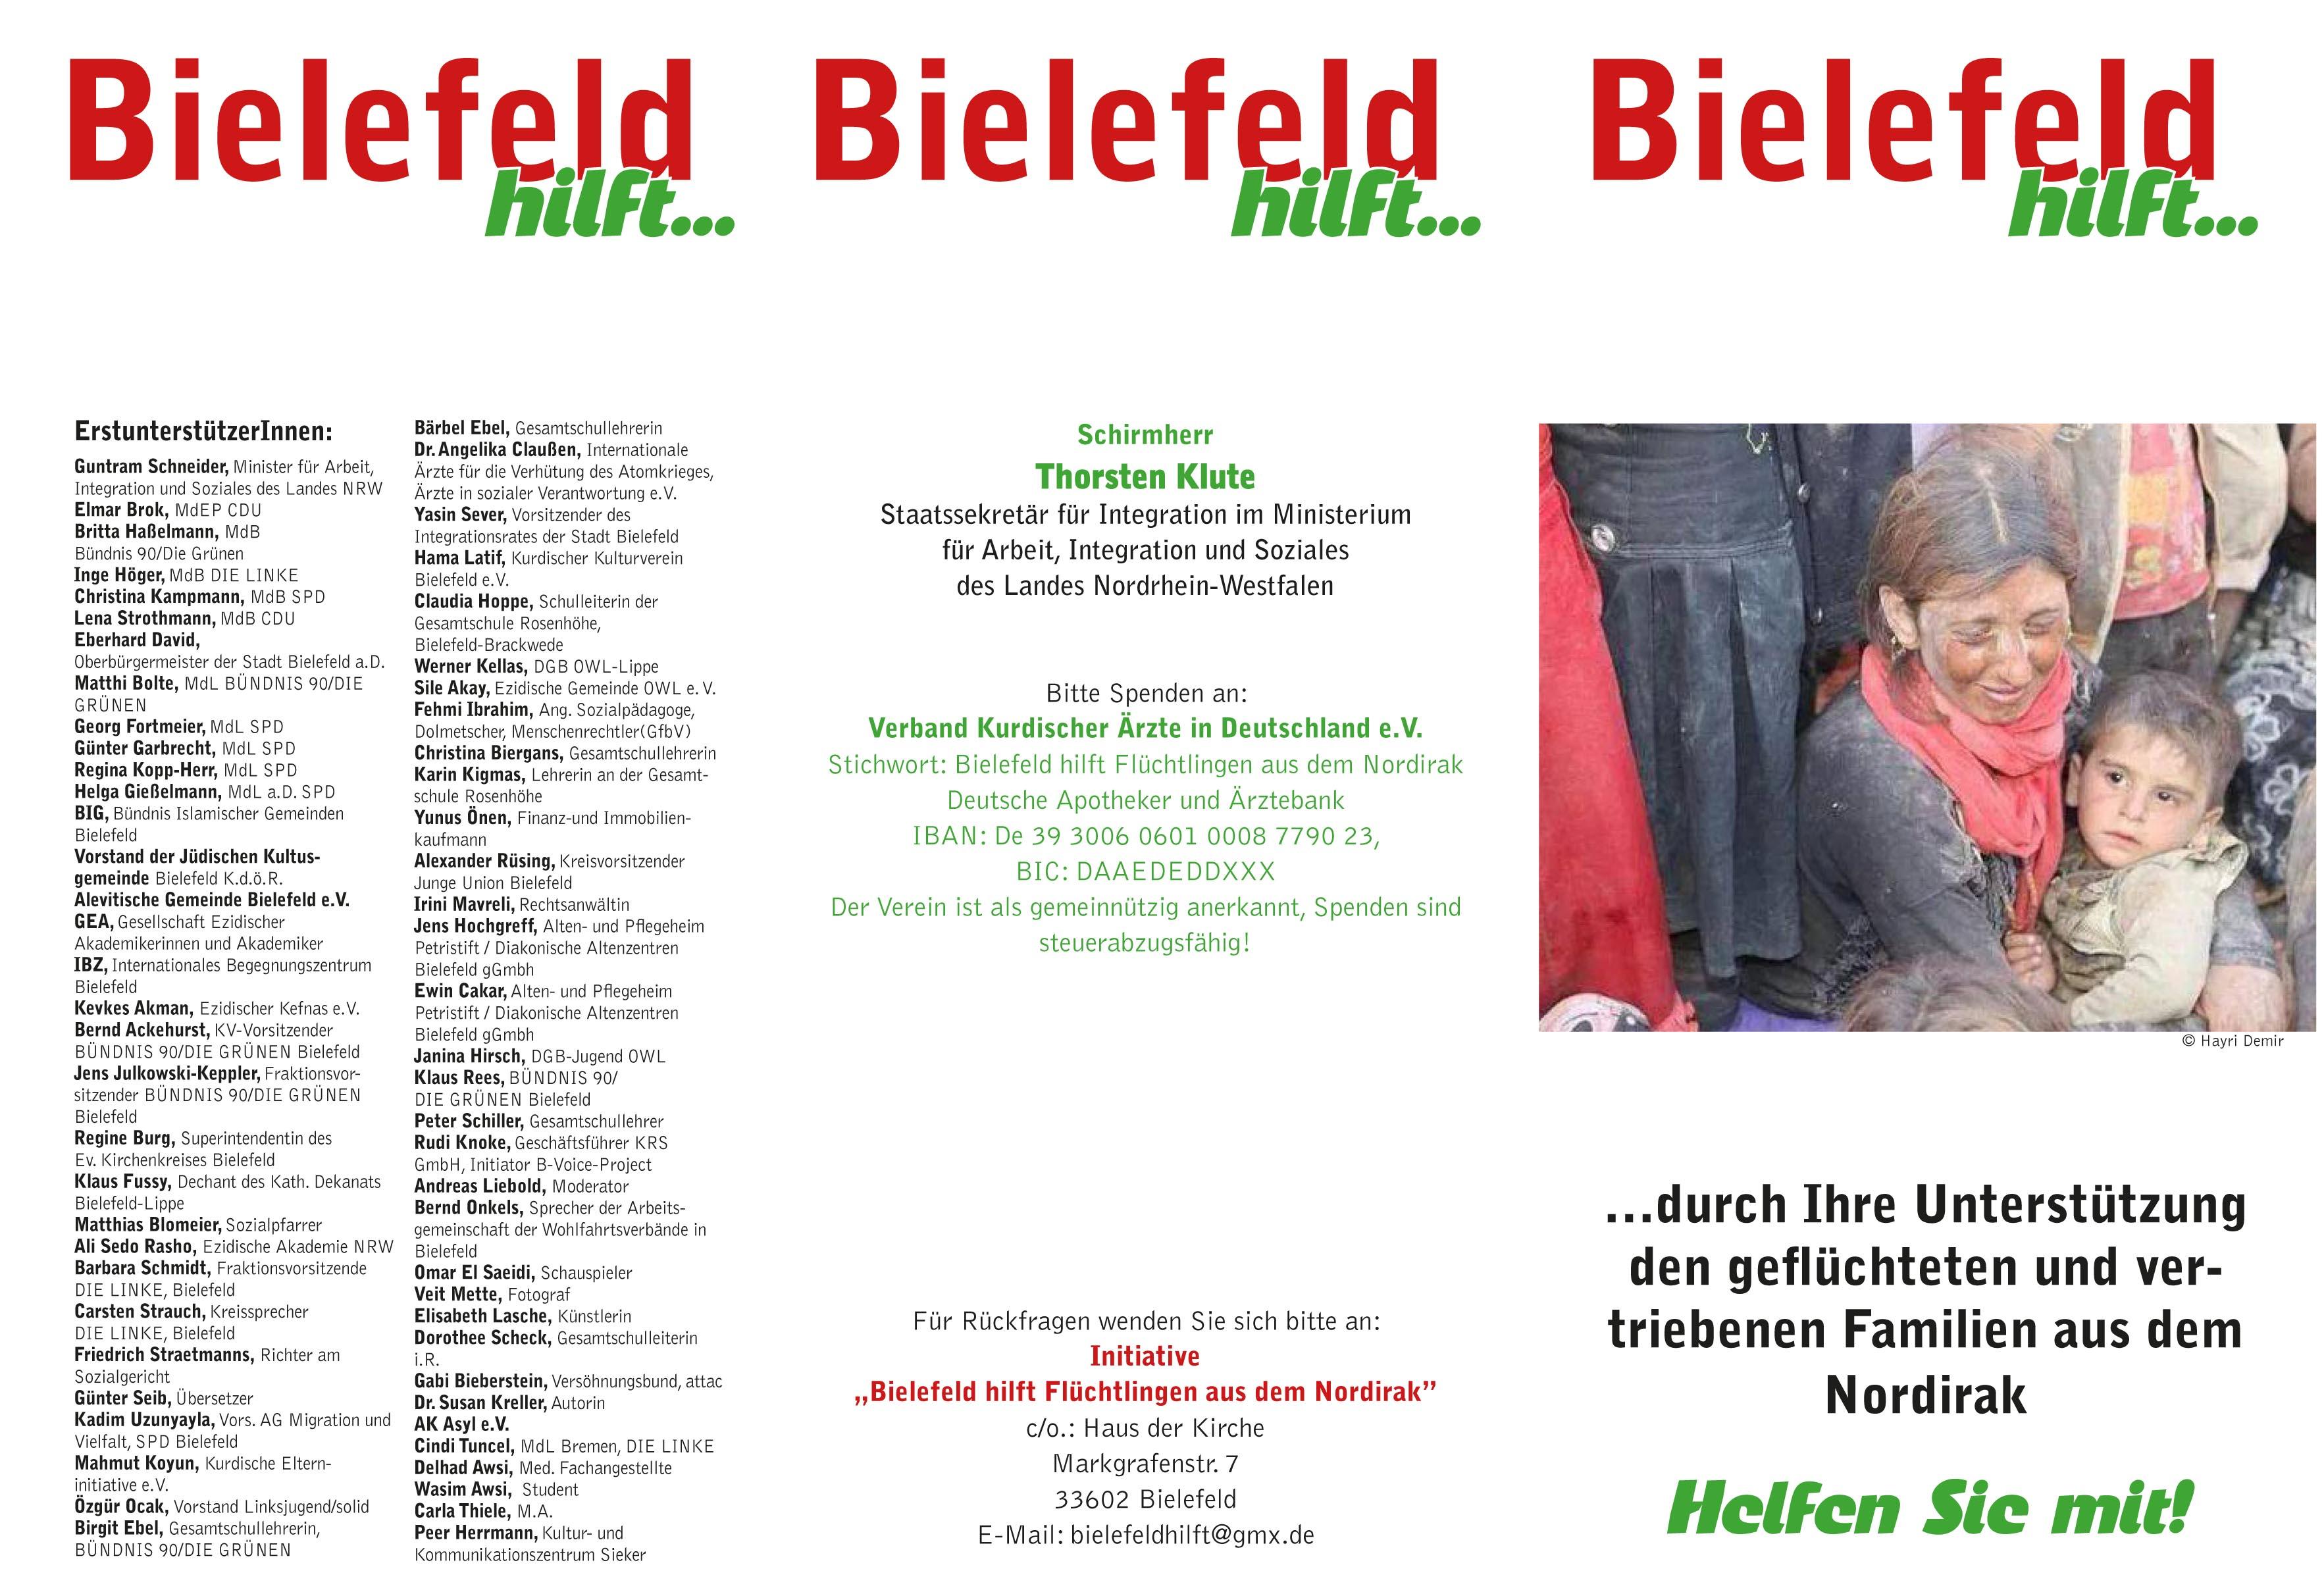 Flyer_Bielefeld_hilft.indd